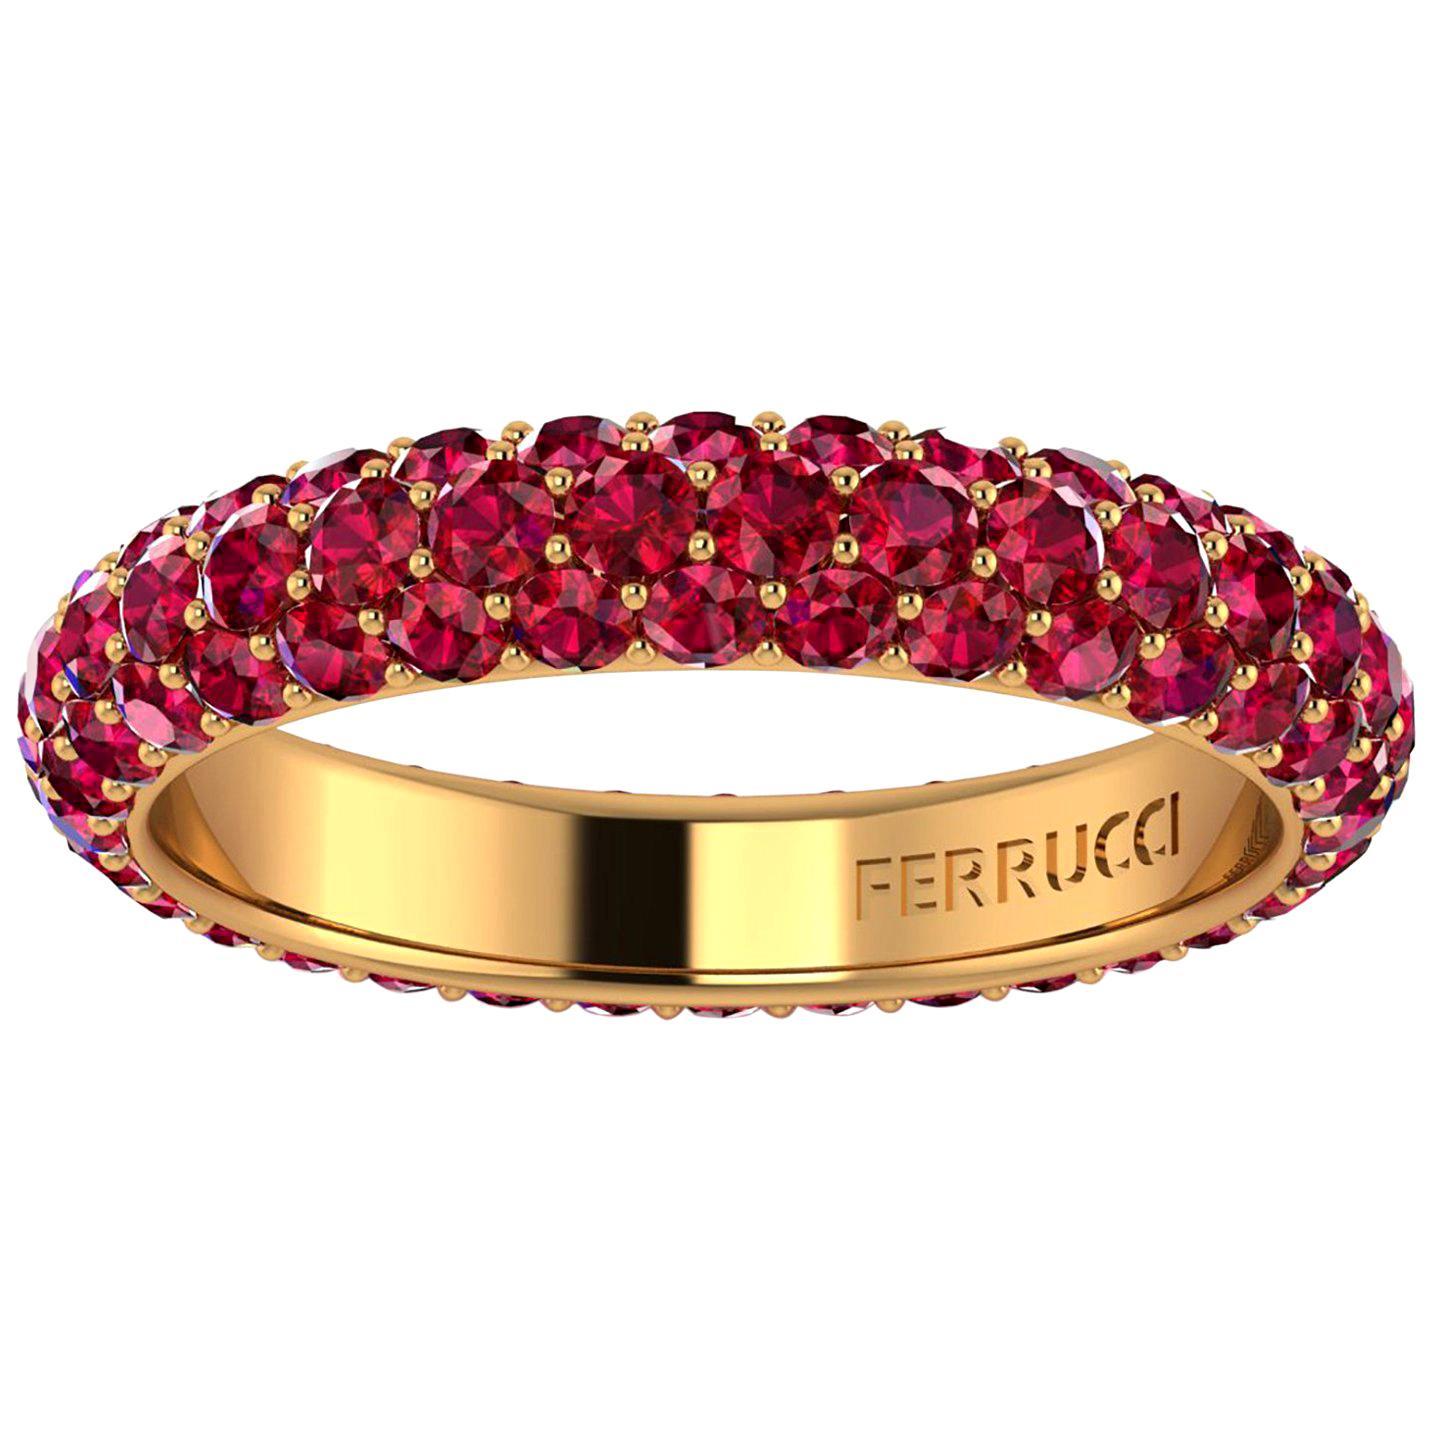 2.1 Carat Ruby Pave Eternity Ring in 18 Karat Yellow Gold